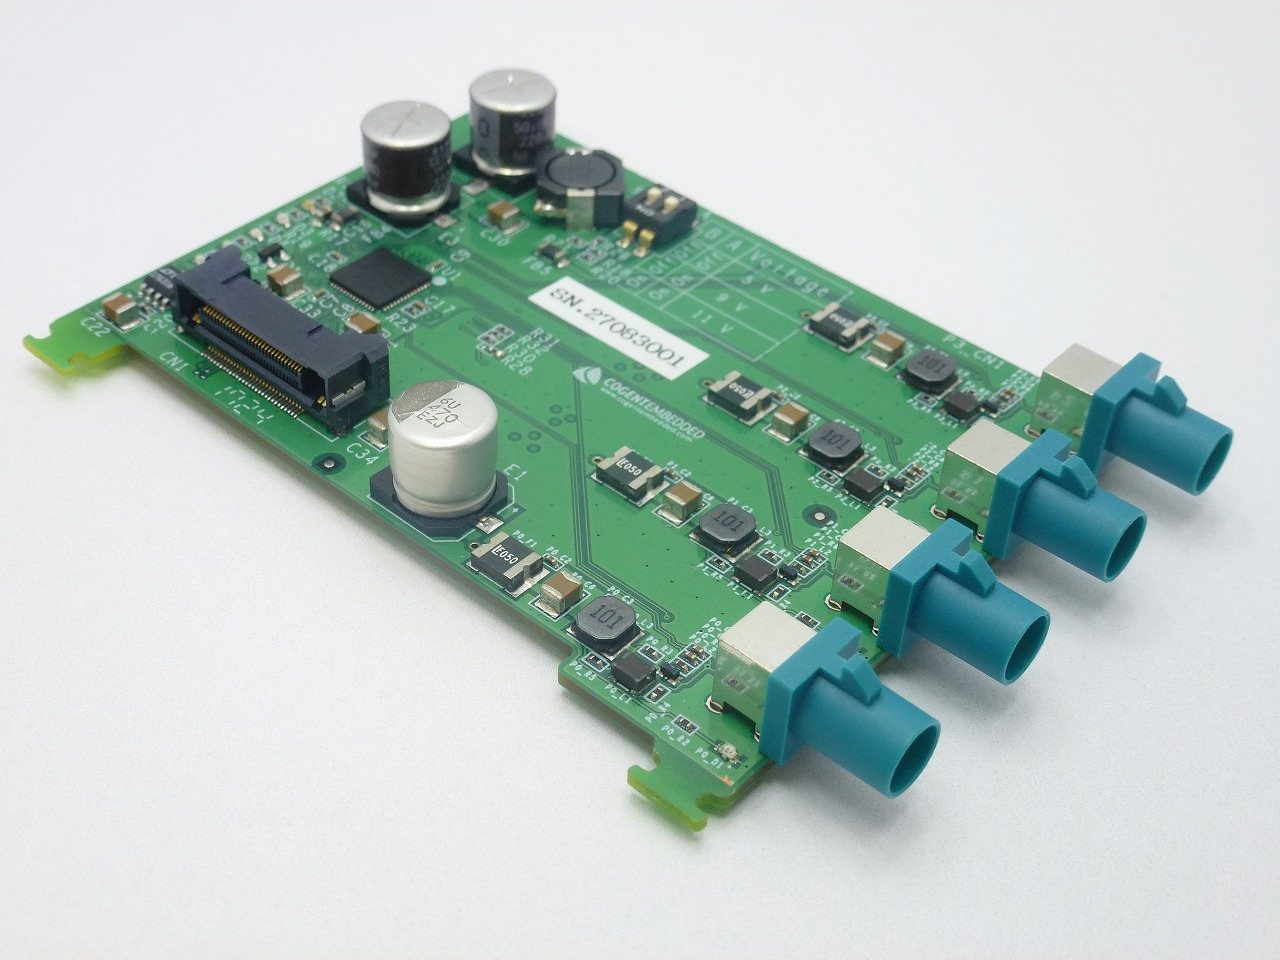 SBEV-RCAR-KF-GMSL01 (GMSL Camera Board)